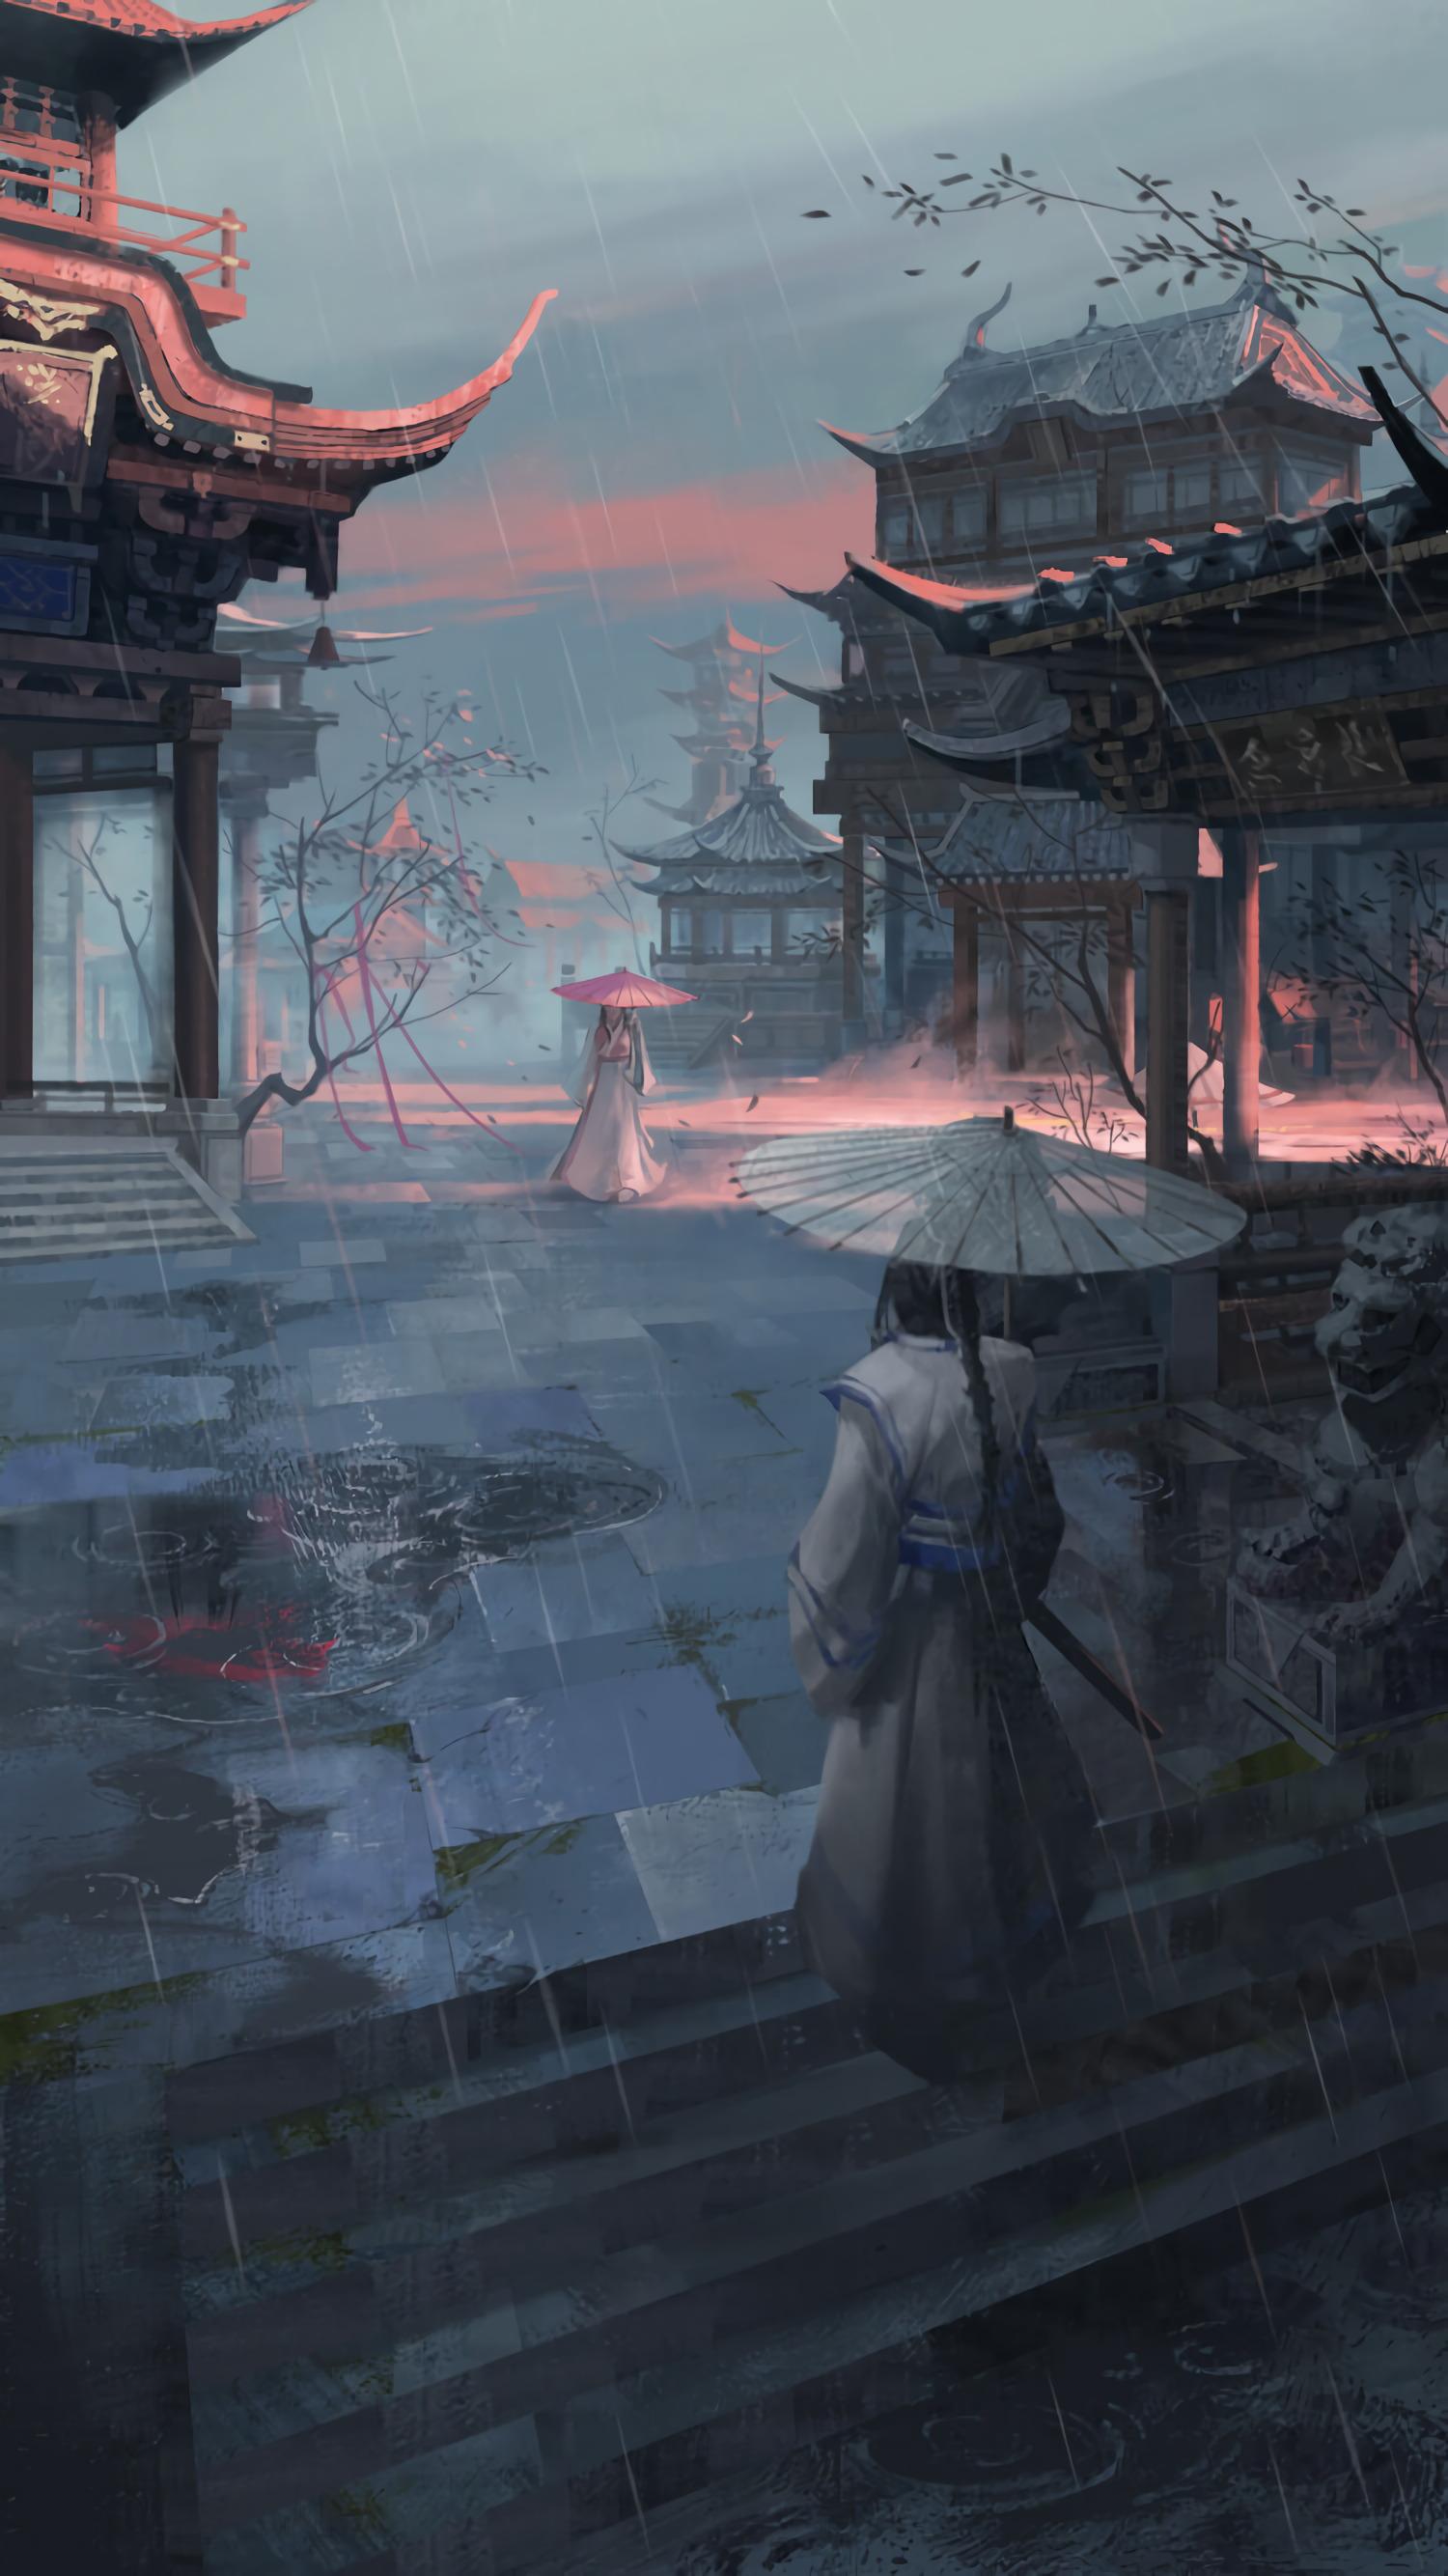 111276 download wallpaper Girls, Pagodas, Pagoda, Rain, Umbrellas, Japan, Art screensavers and pictures for free